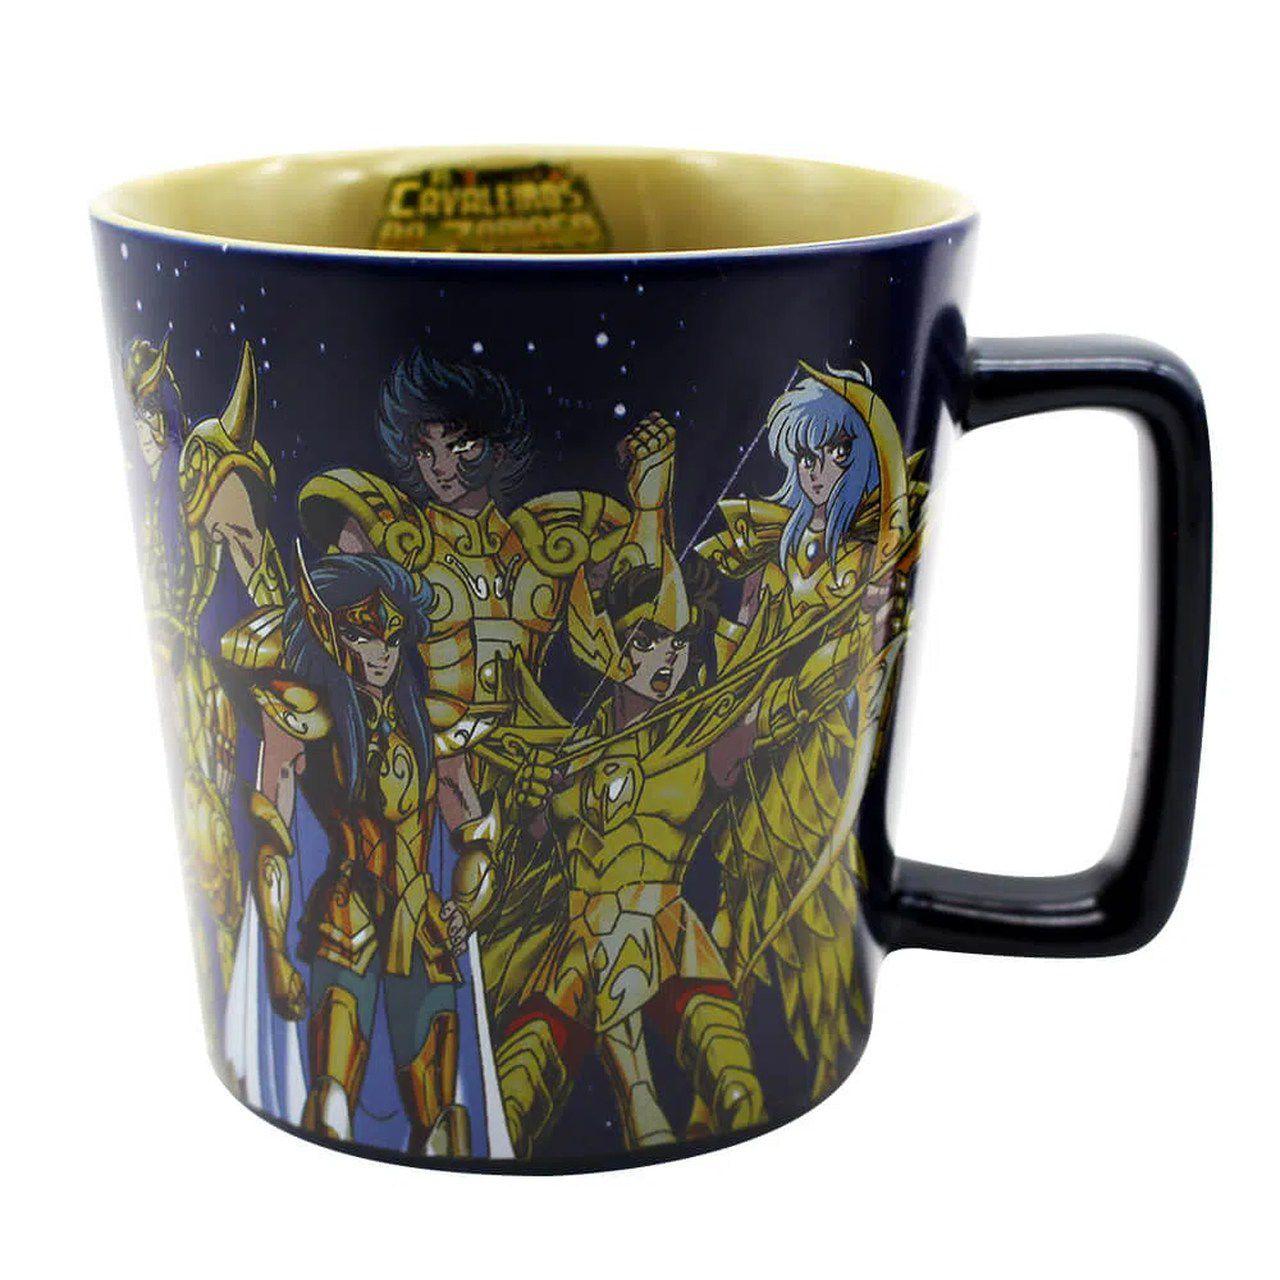 Caneca Buck Cavaleiros de Ouro: Os Cavaleiros do Zodíaco (Saint Seiya) 400ml - Zona Criativa